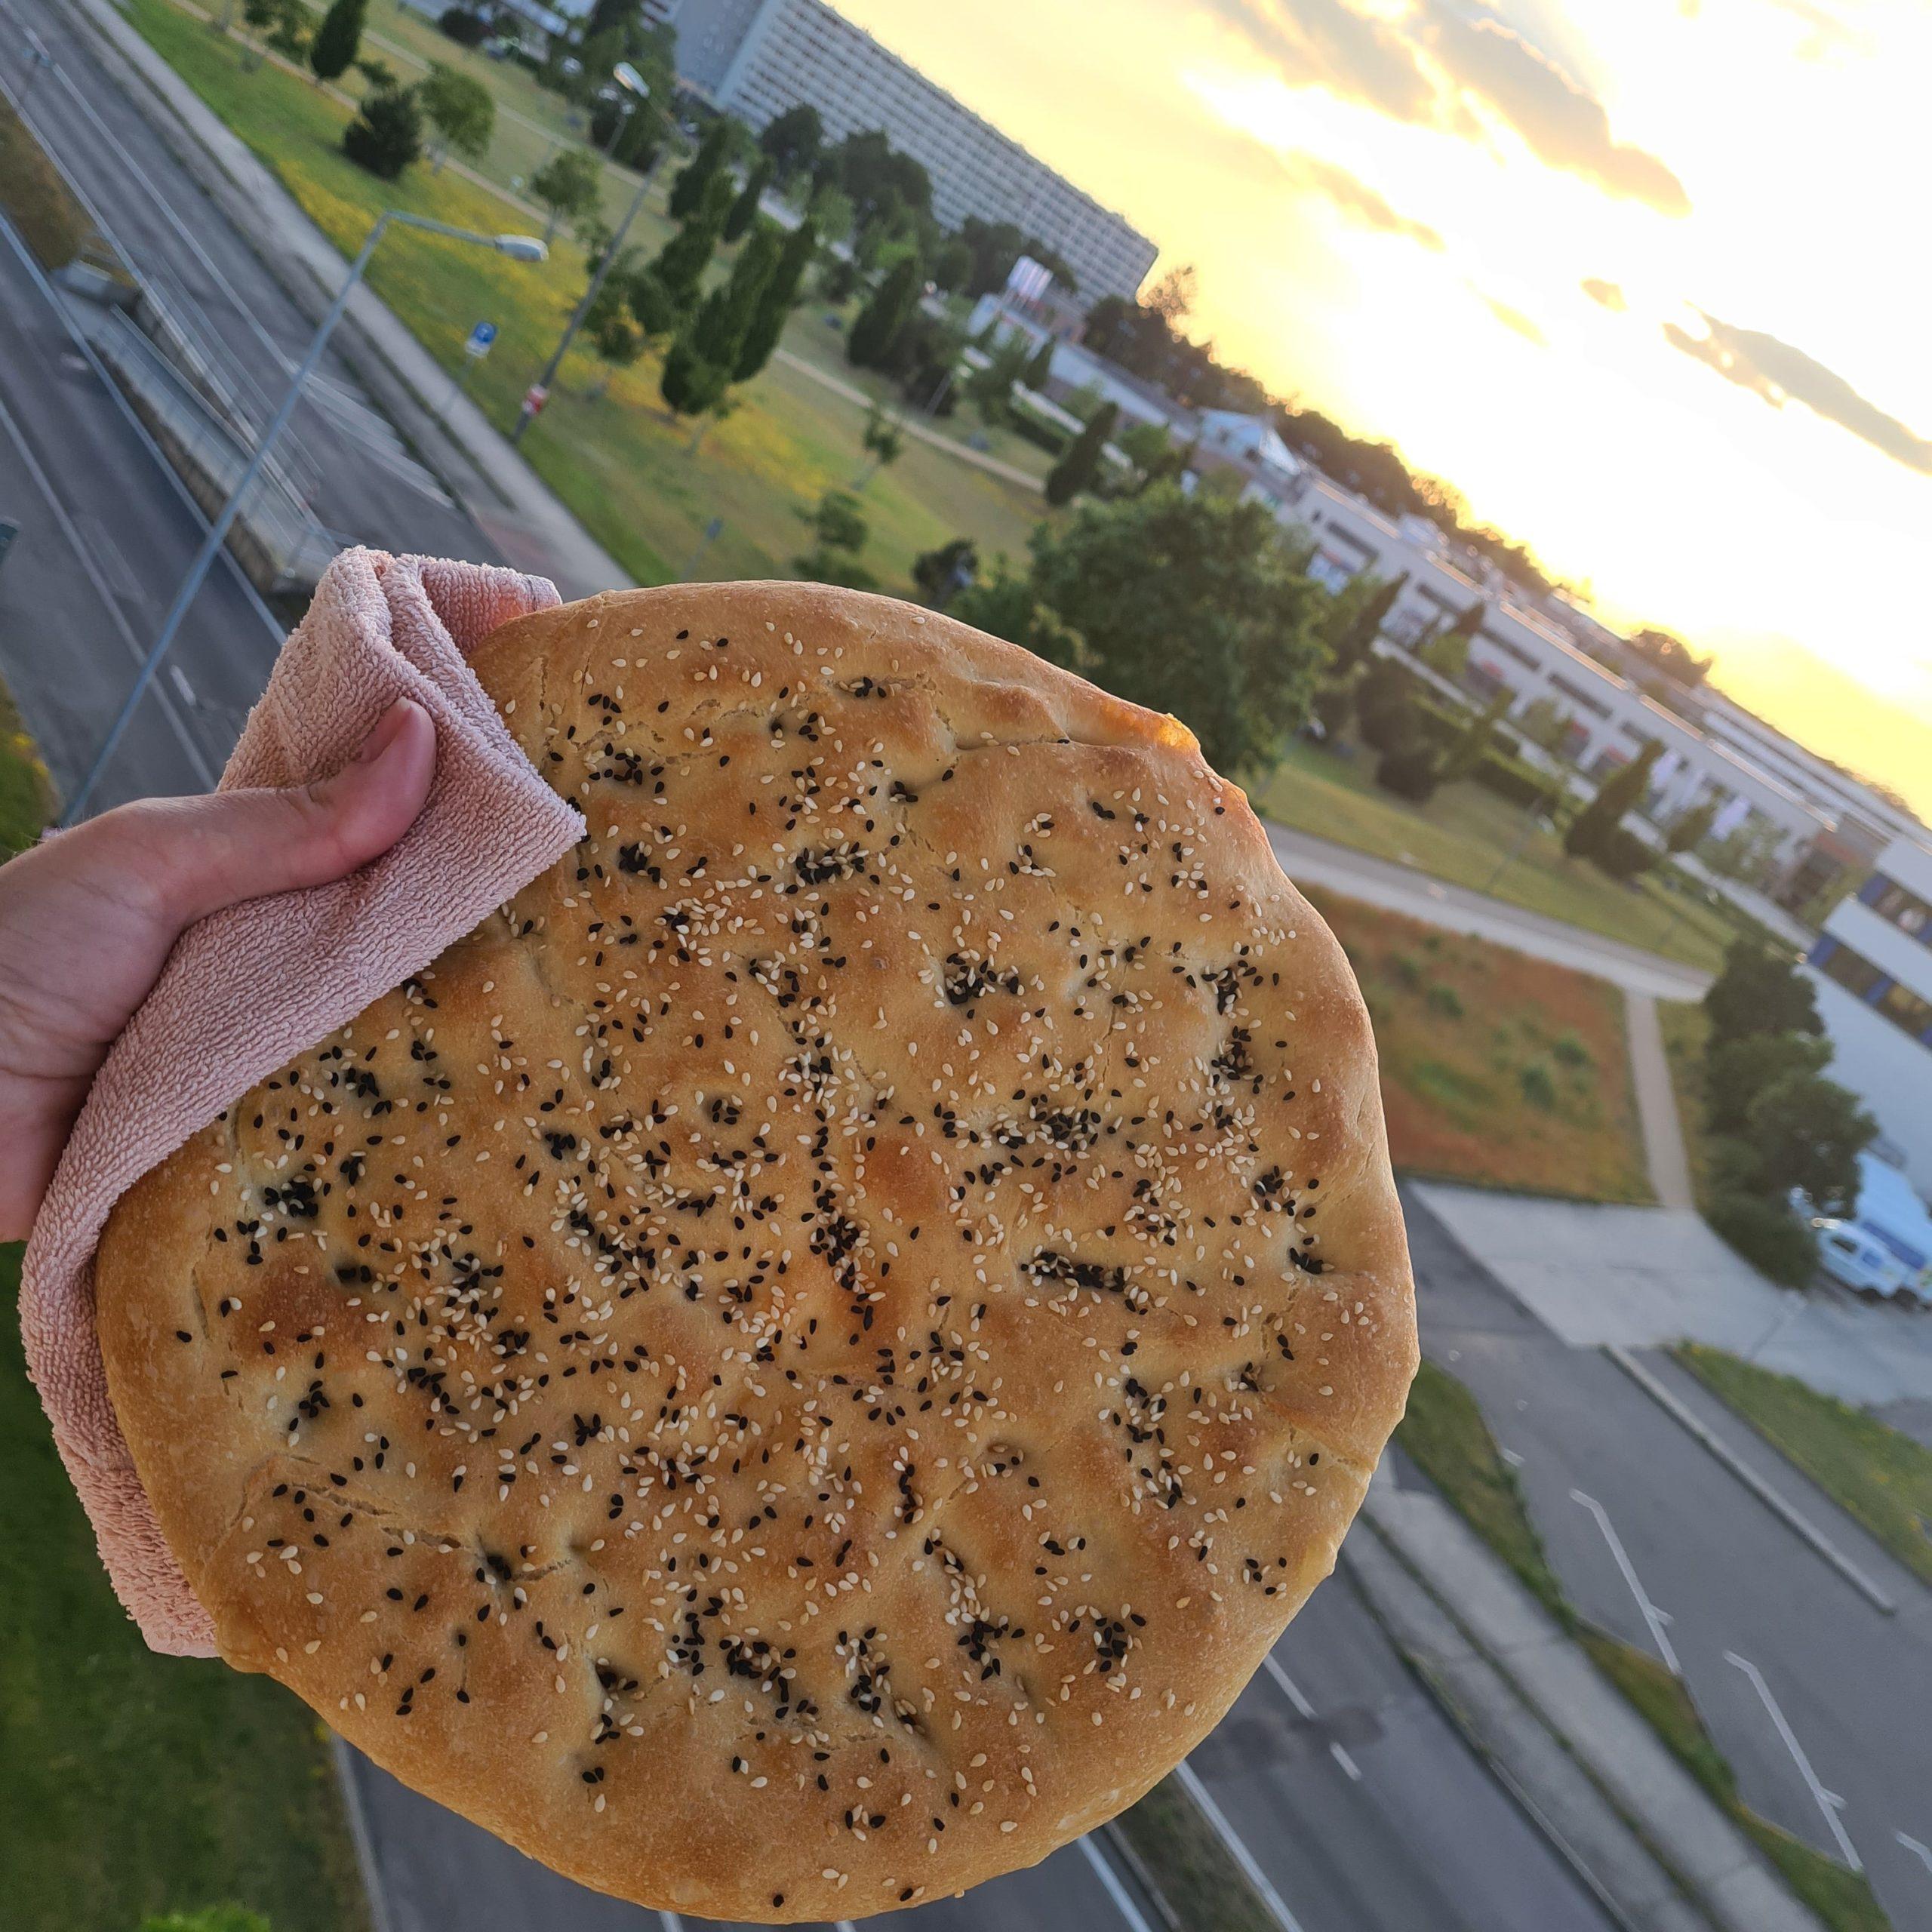 Brot vor Stadtpanorama